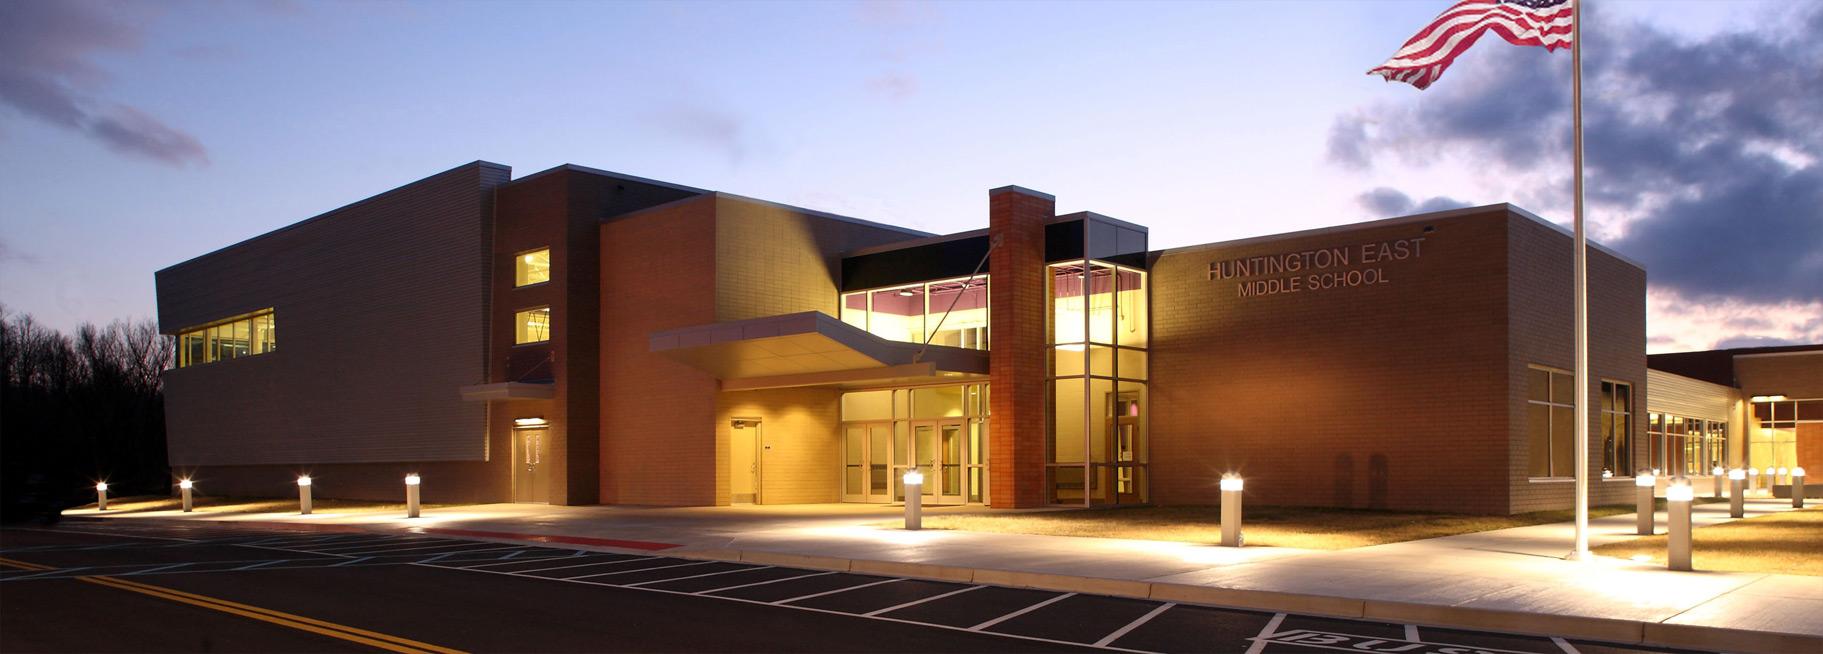 Huntington East Middle School | ZMM Architects & Engineers